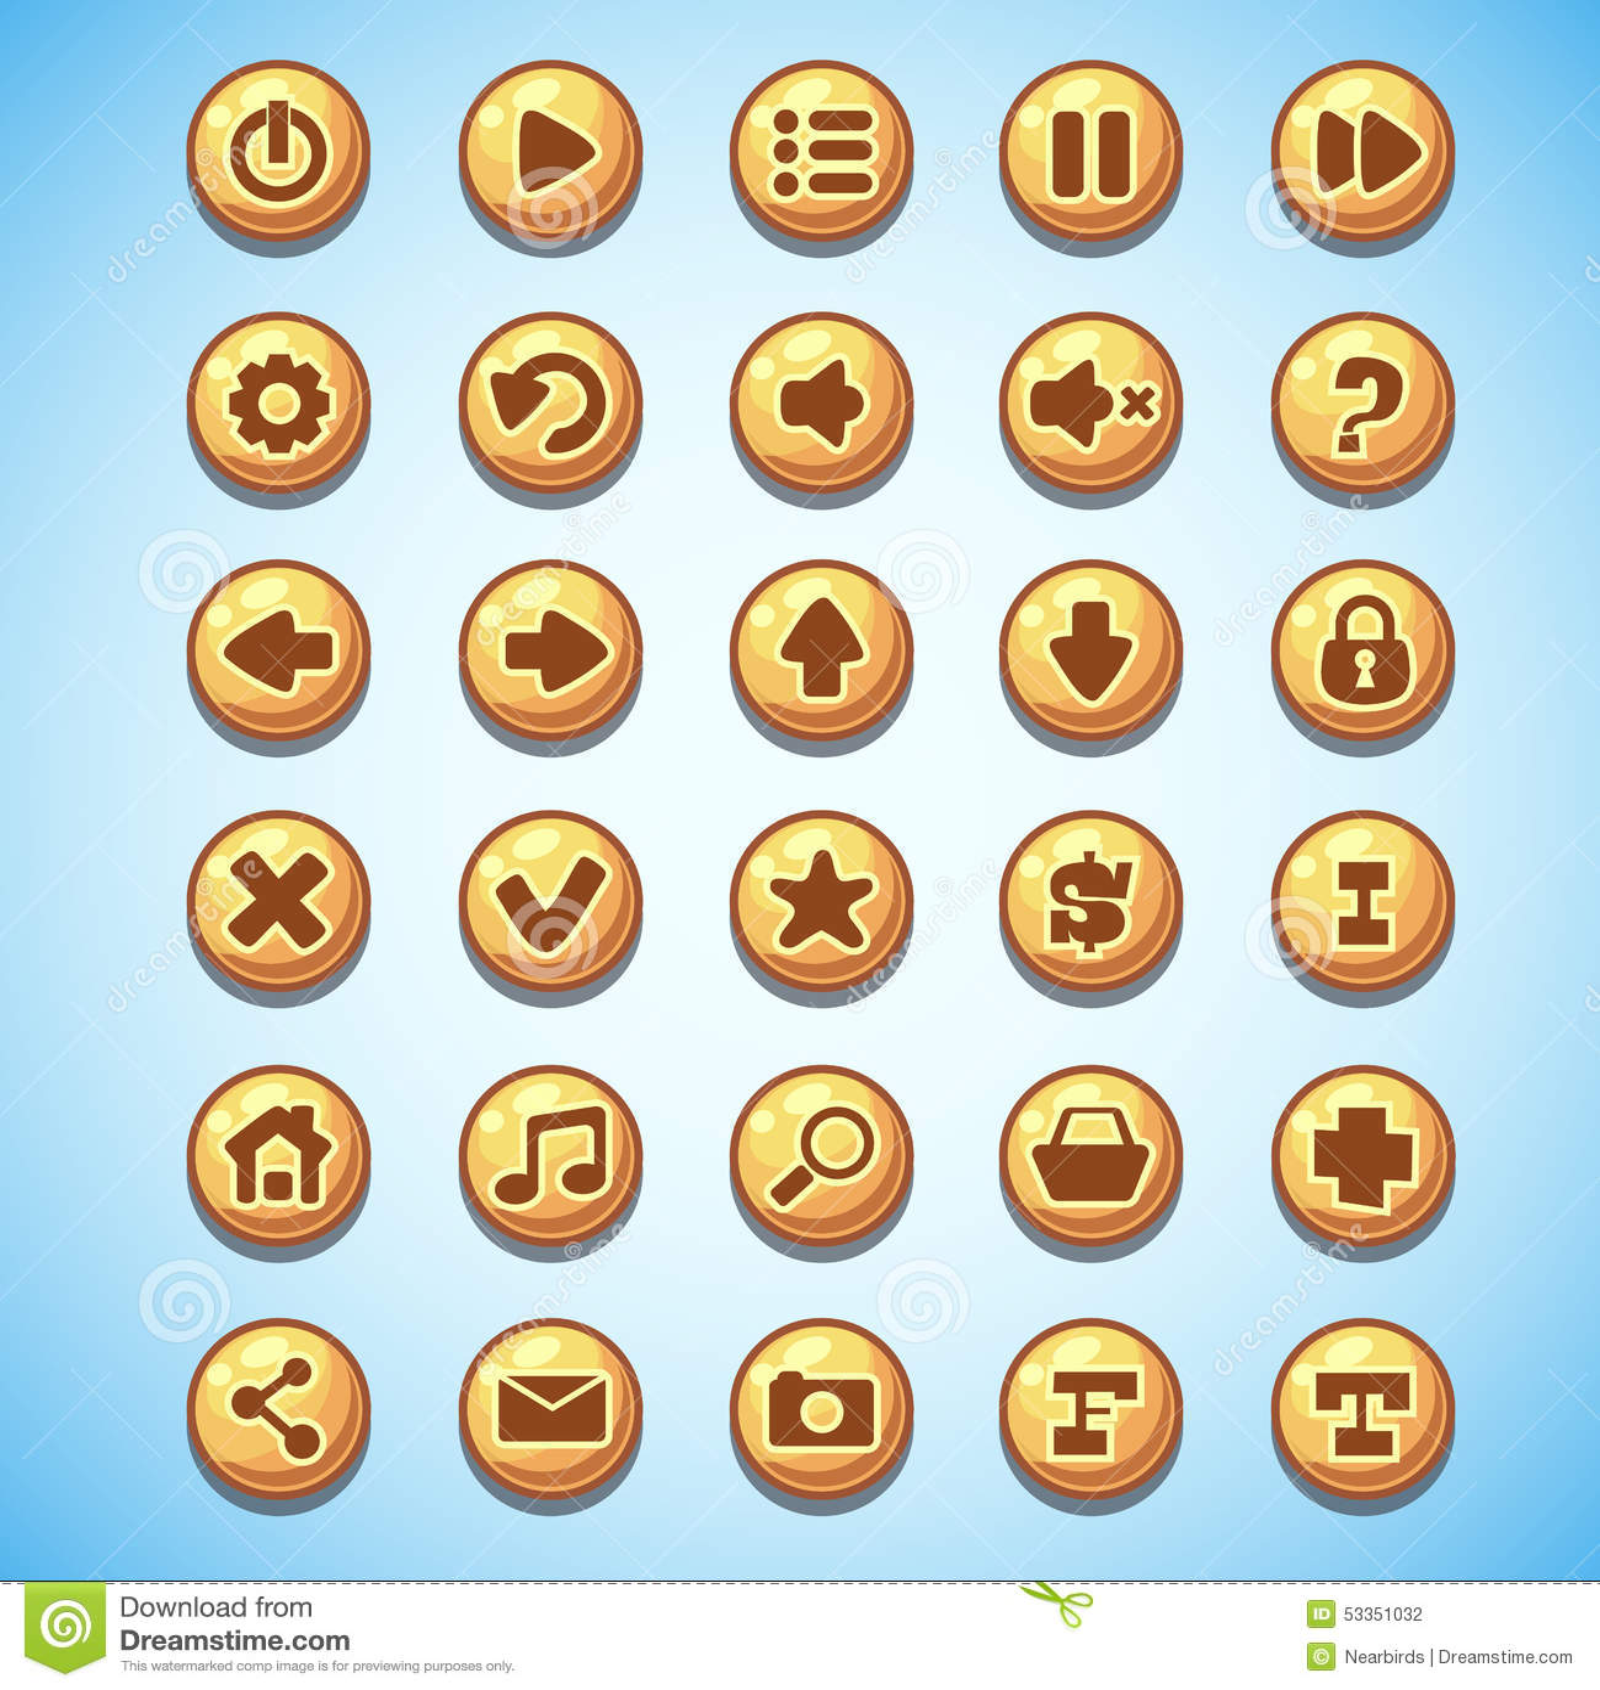 Big set of round buttons cartoon computer game Wild West